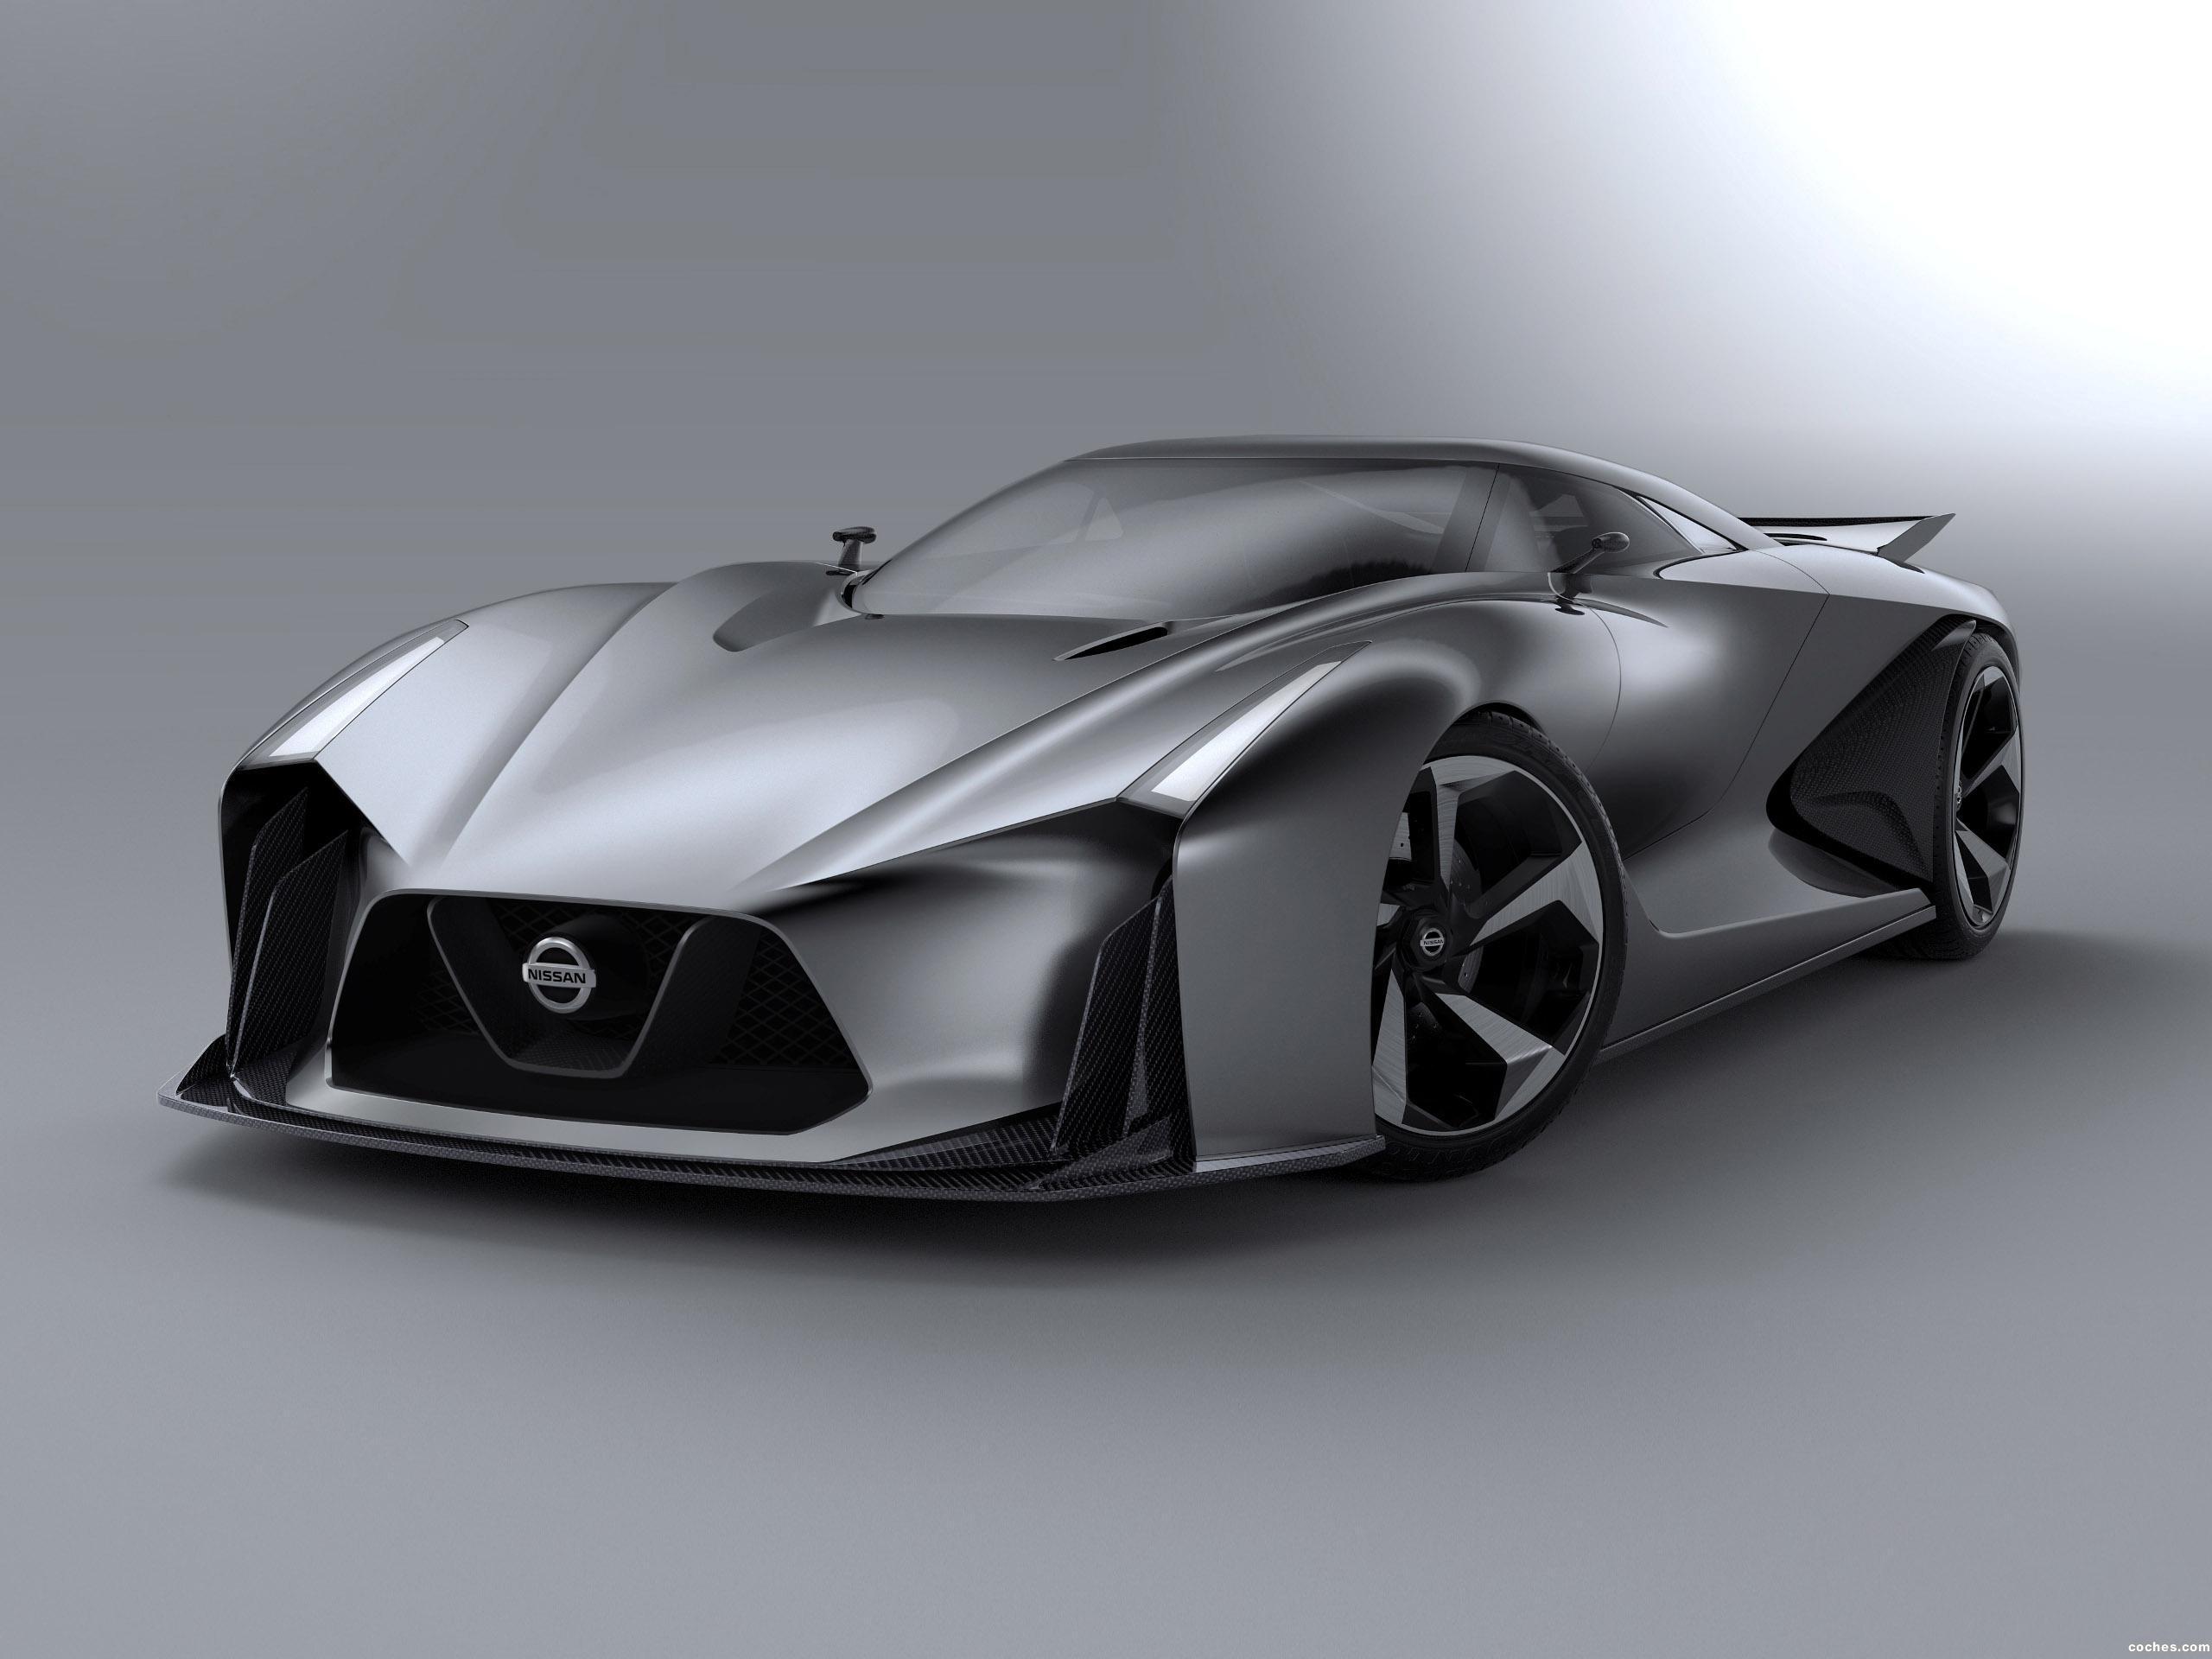 Foto 0 de Nissan Concept Vision Gran Turismo 2014